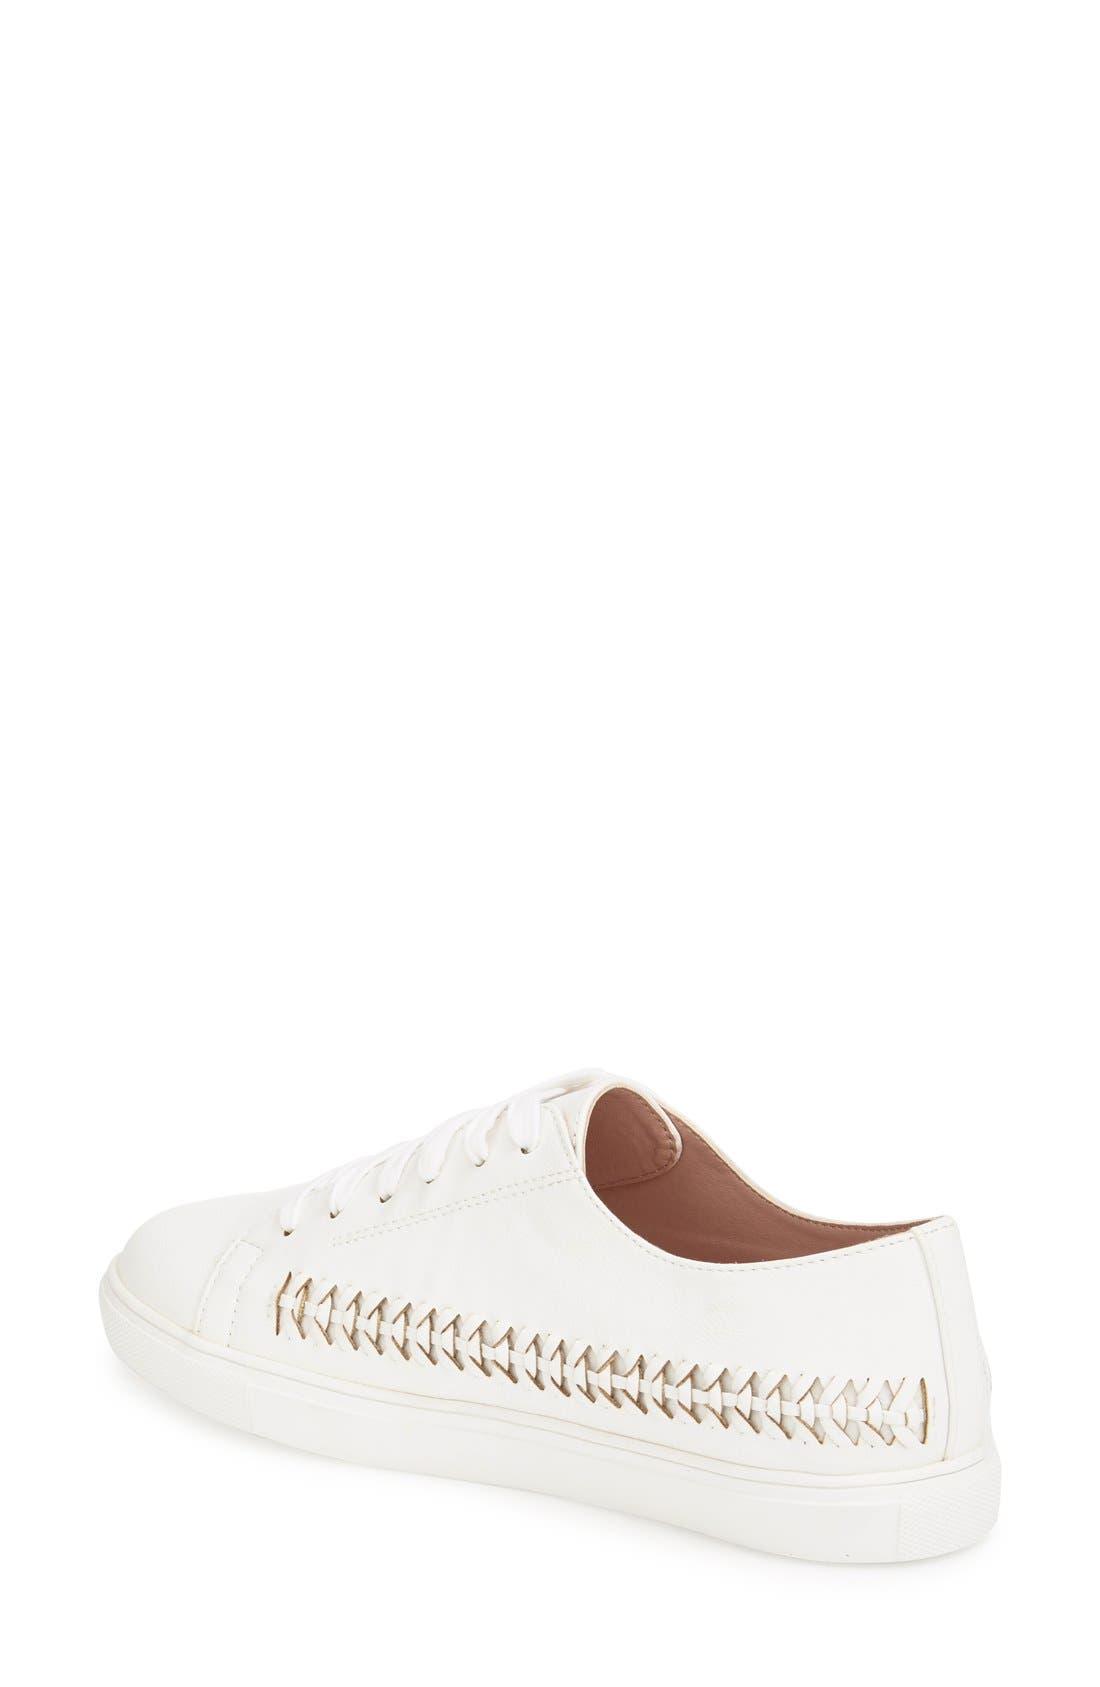 Alternate Image 2  - Topshop 'Conner Plait' Sneaker (Women)